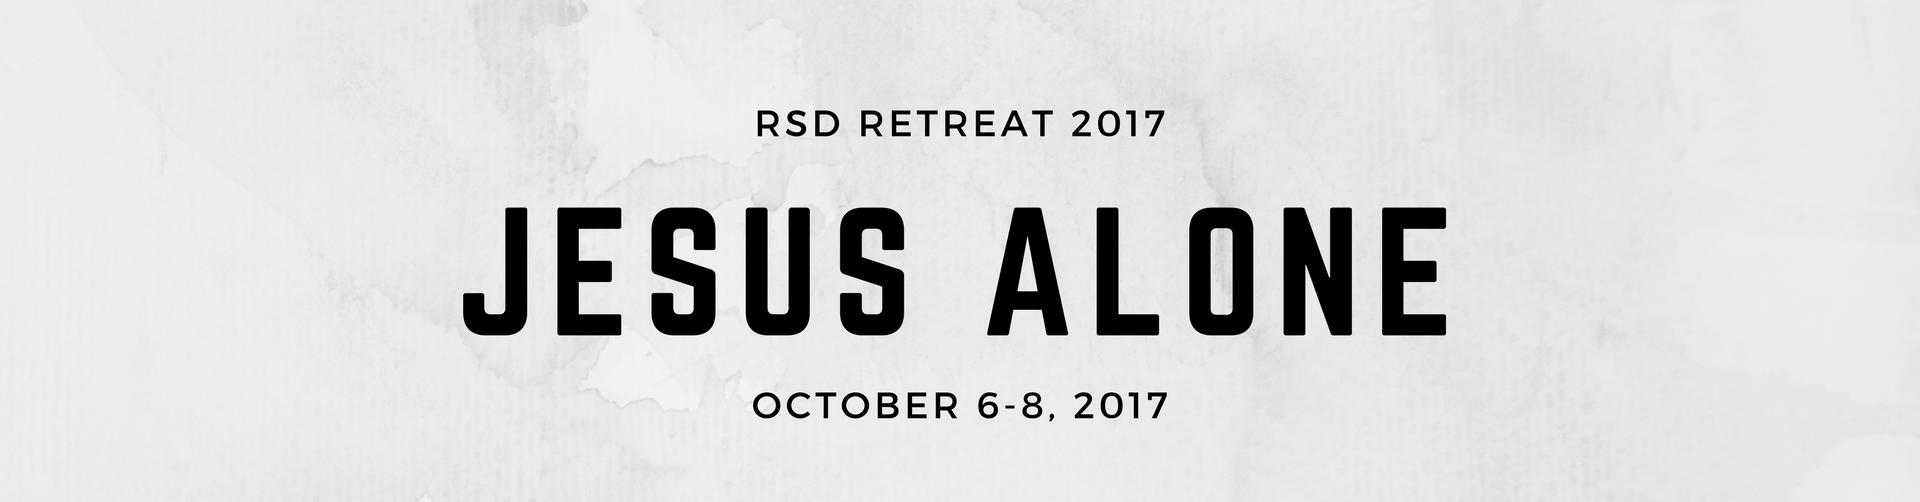 RSD Retreat NEW.png